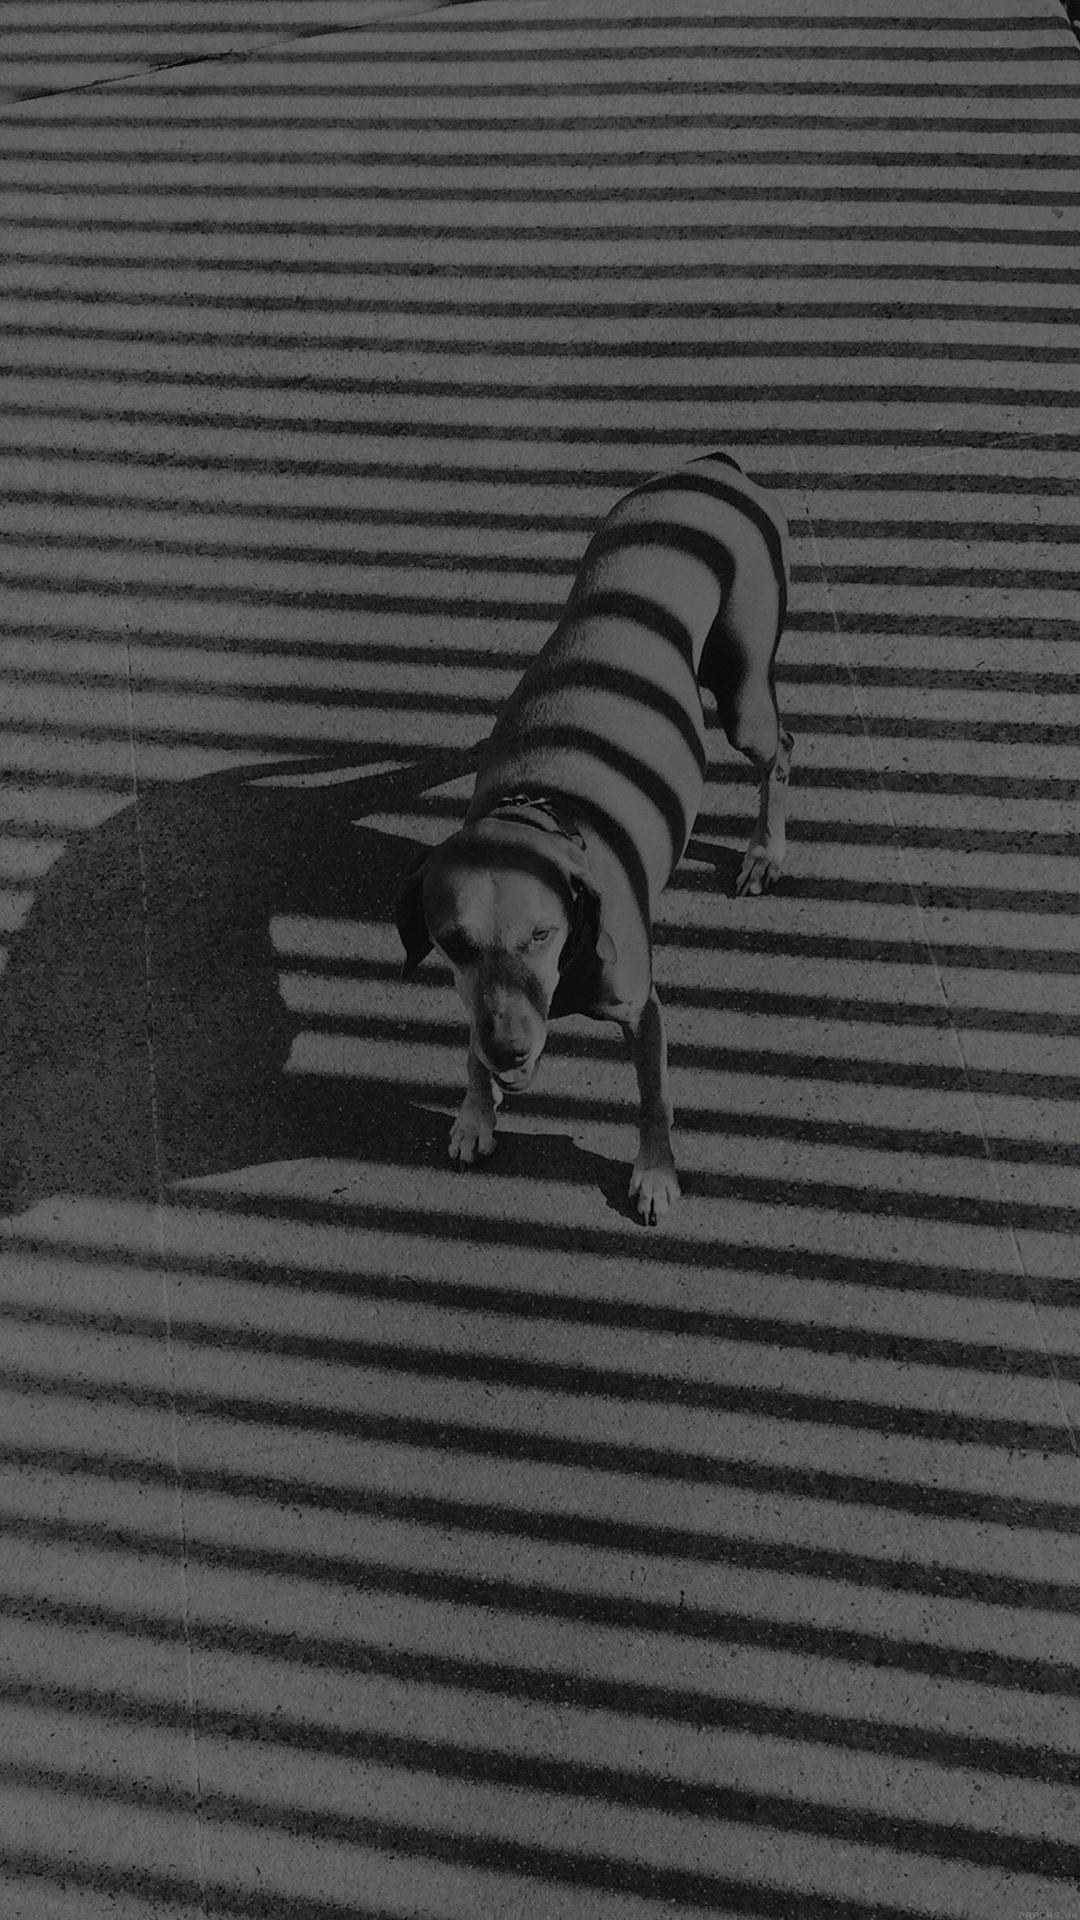 Hot Dog Bw Dark Black Photography Art Nature